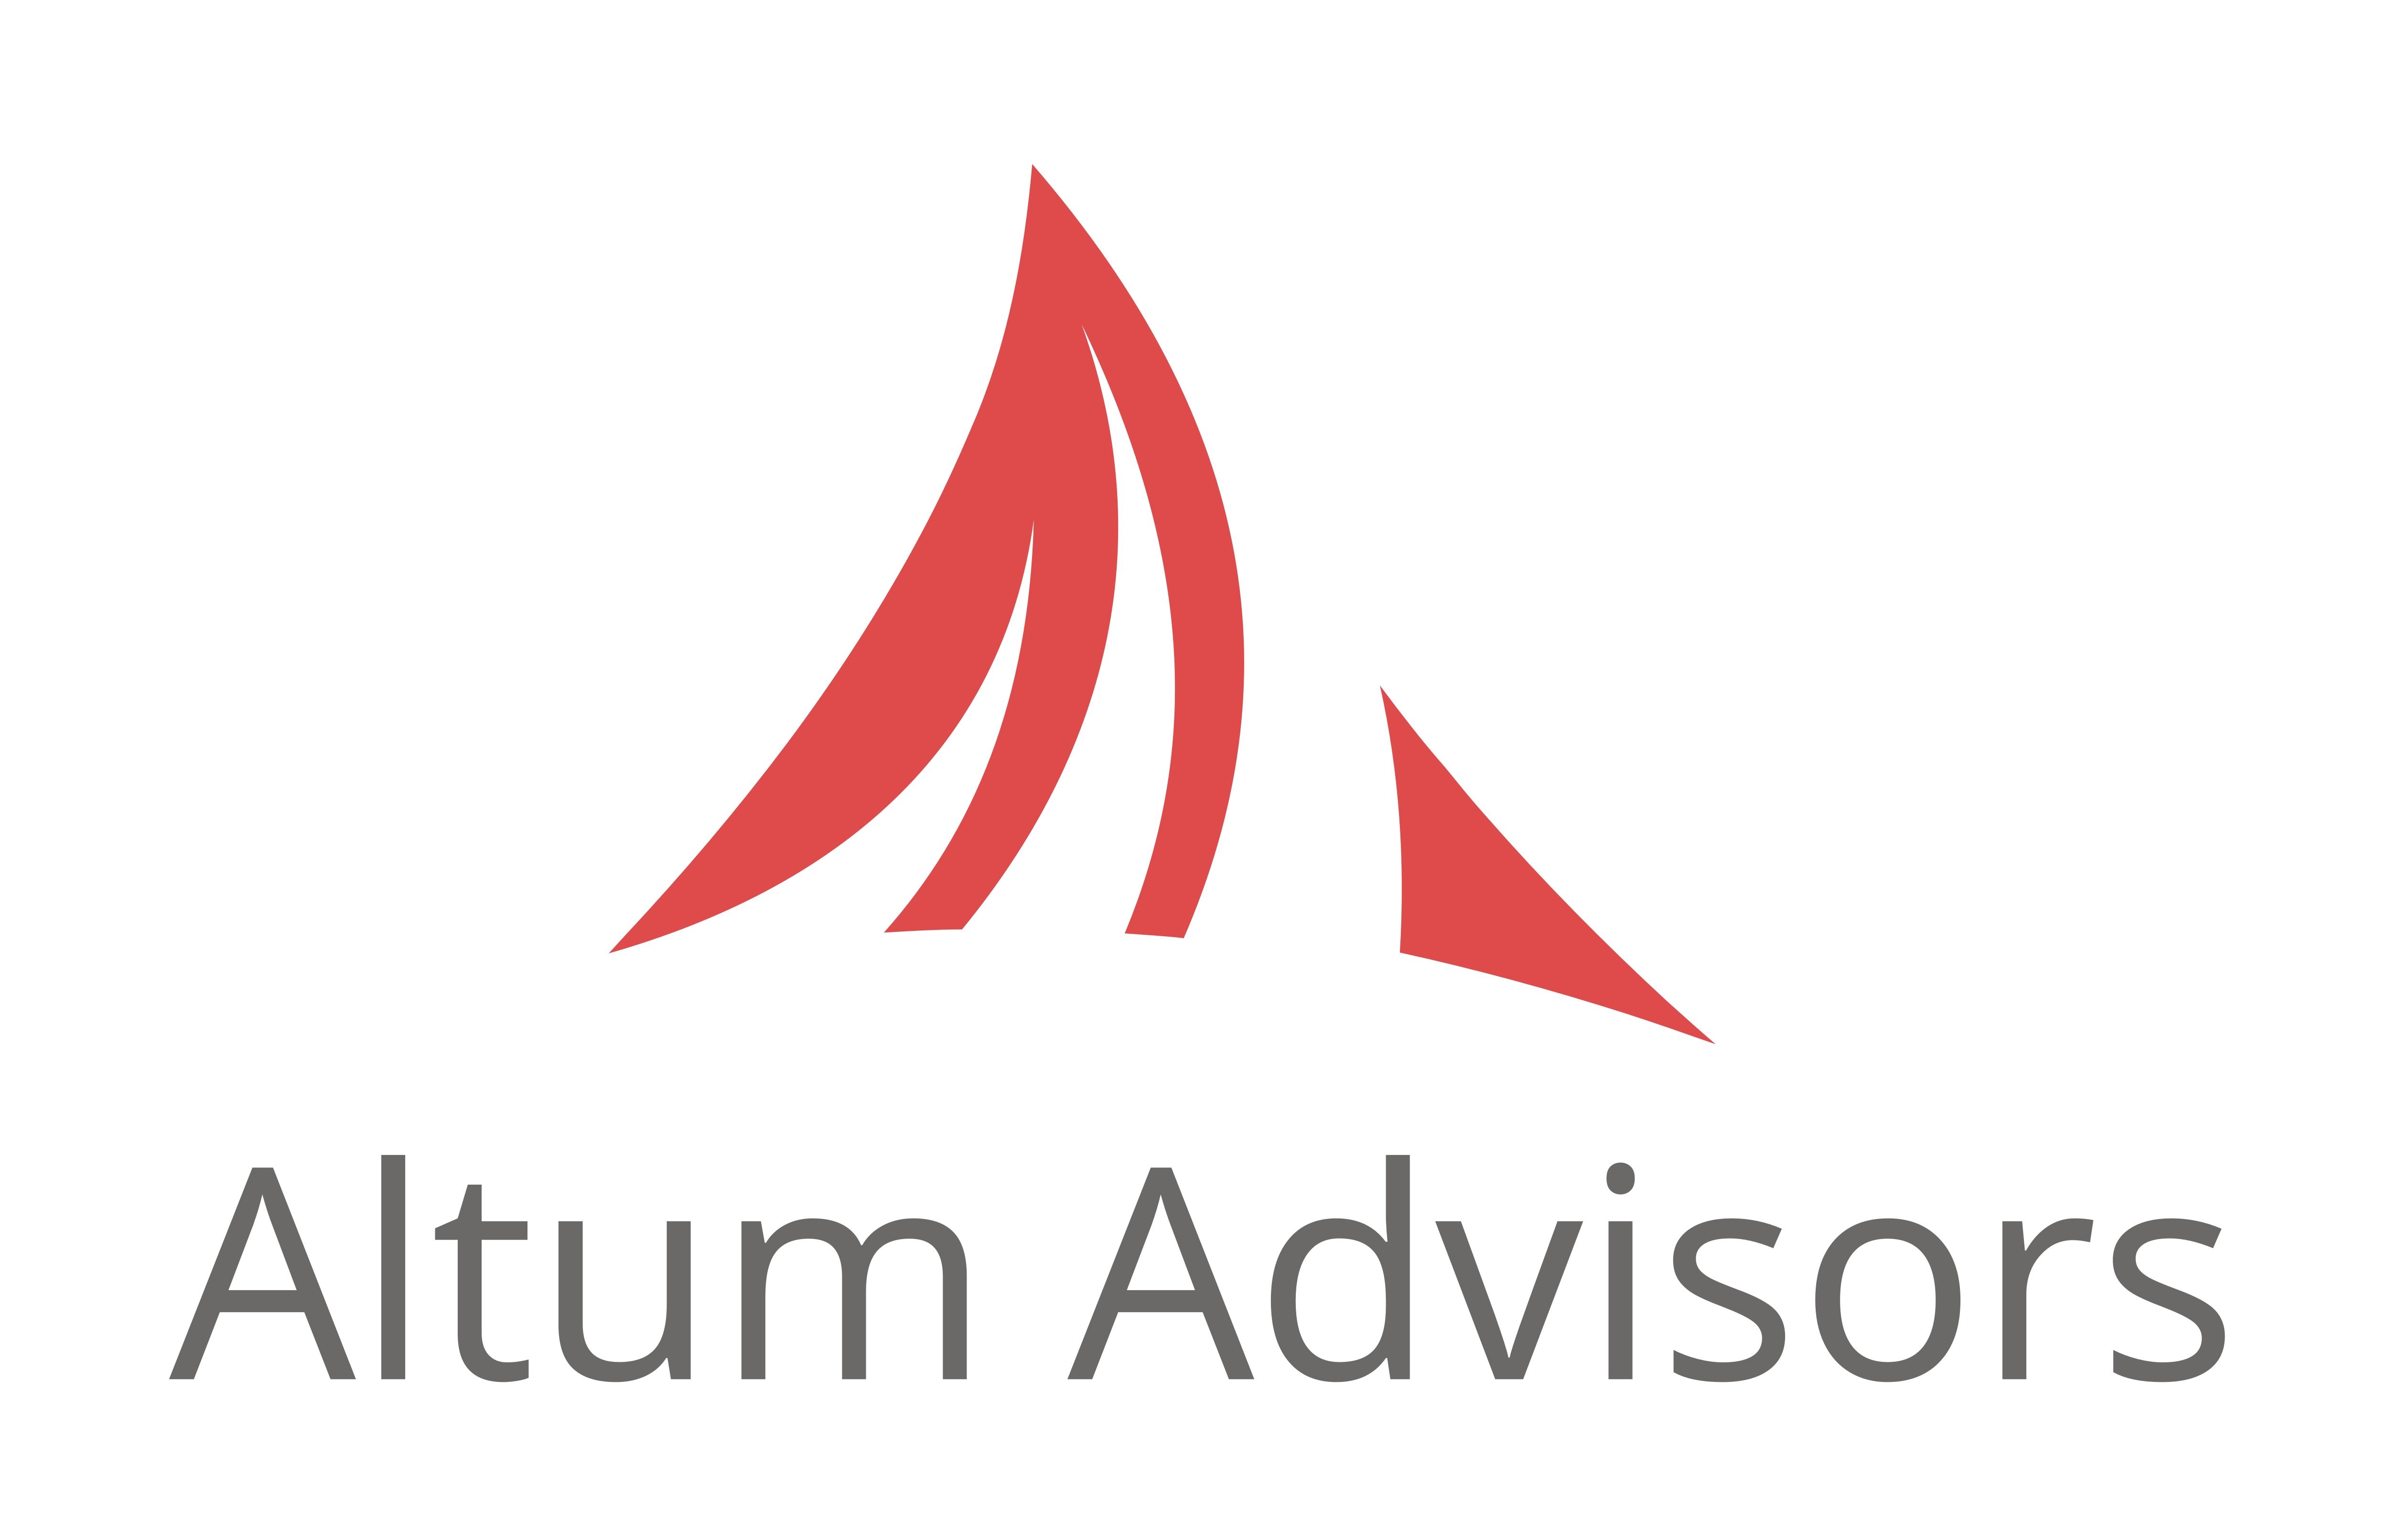 altum advisors- company logo